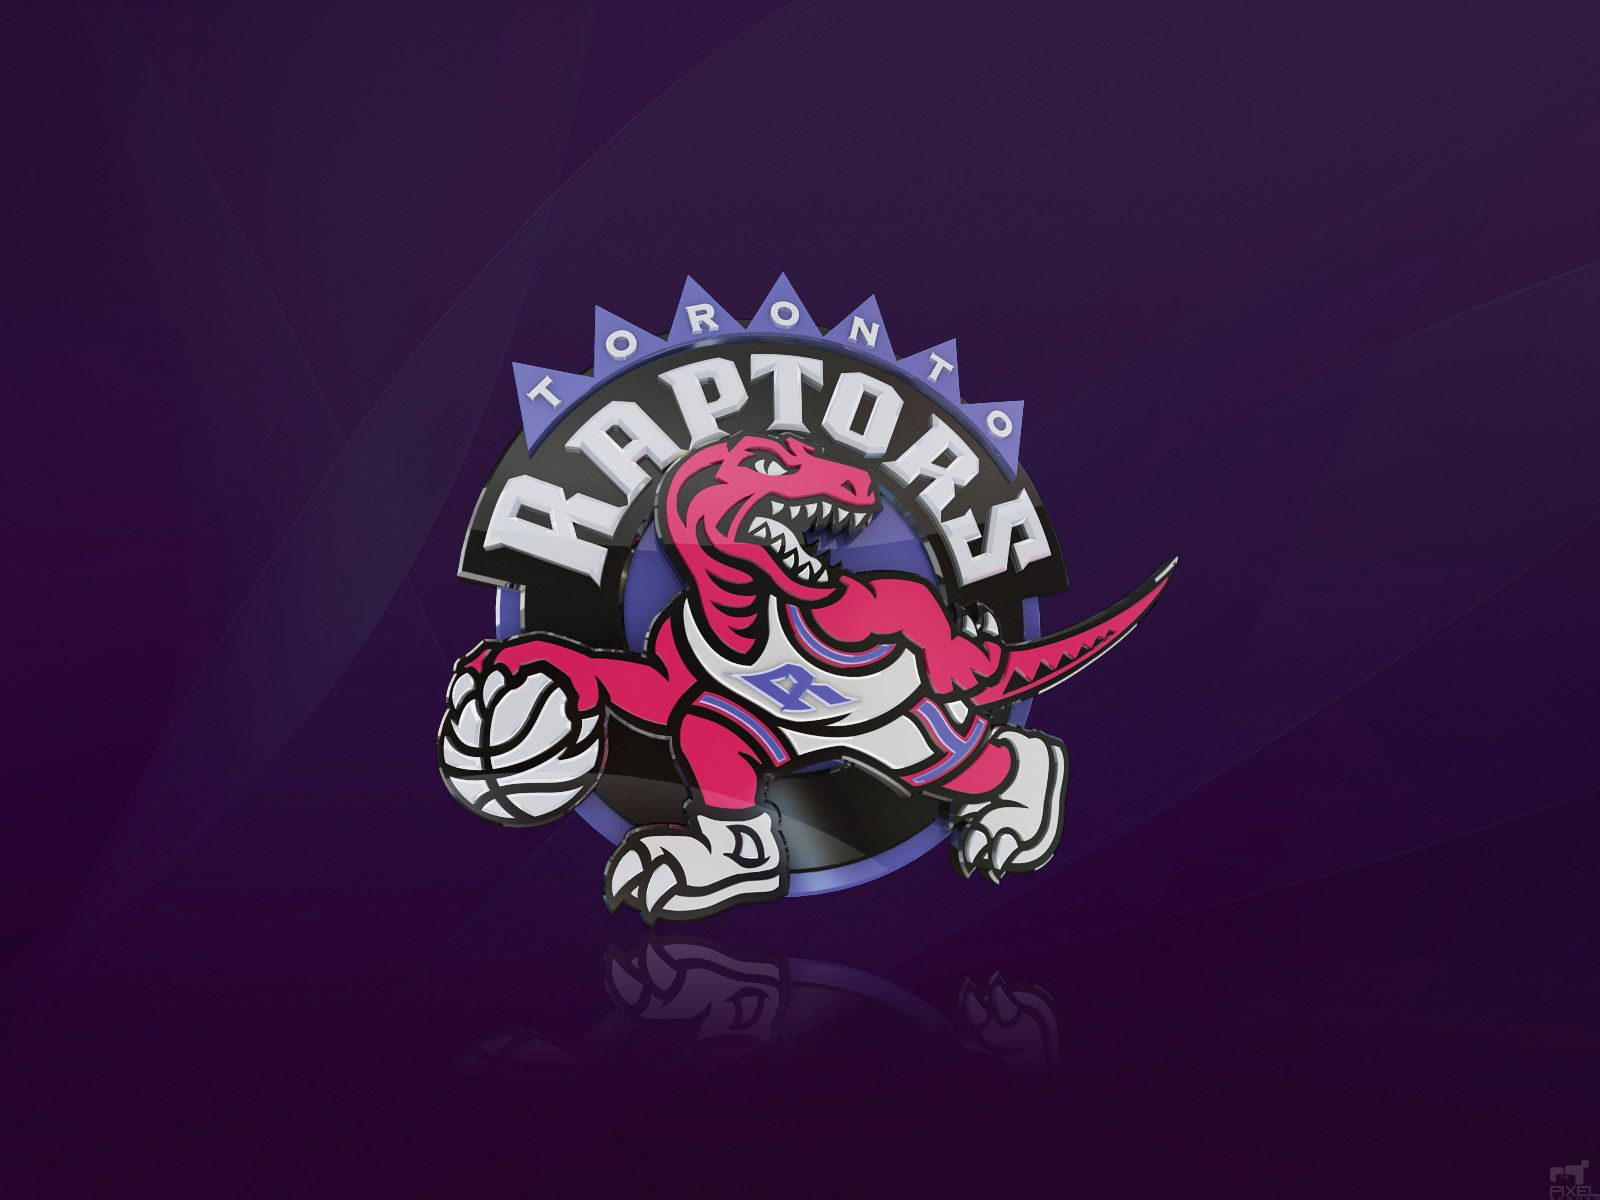 Must see Wallpaper Logo Toronto Raptor - c63718ec42a6b32abb60017f511b0786  You Should Have_877796.jpg